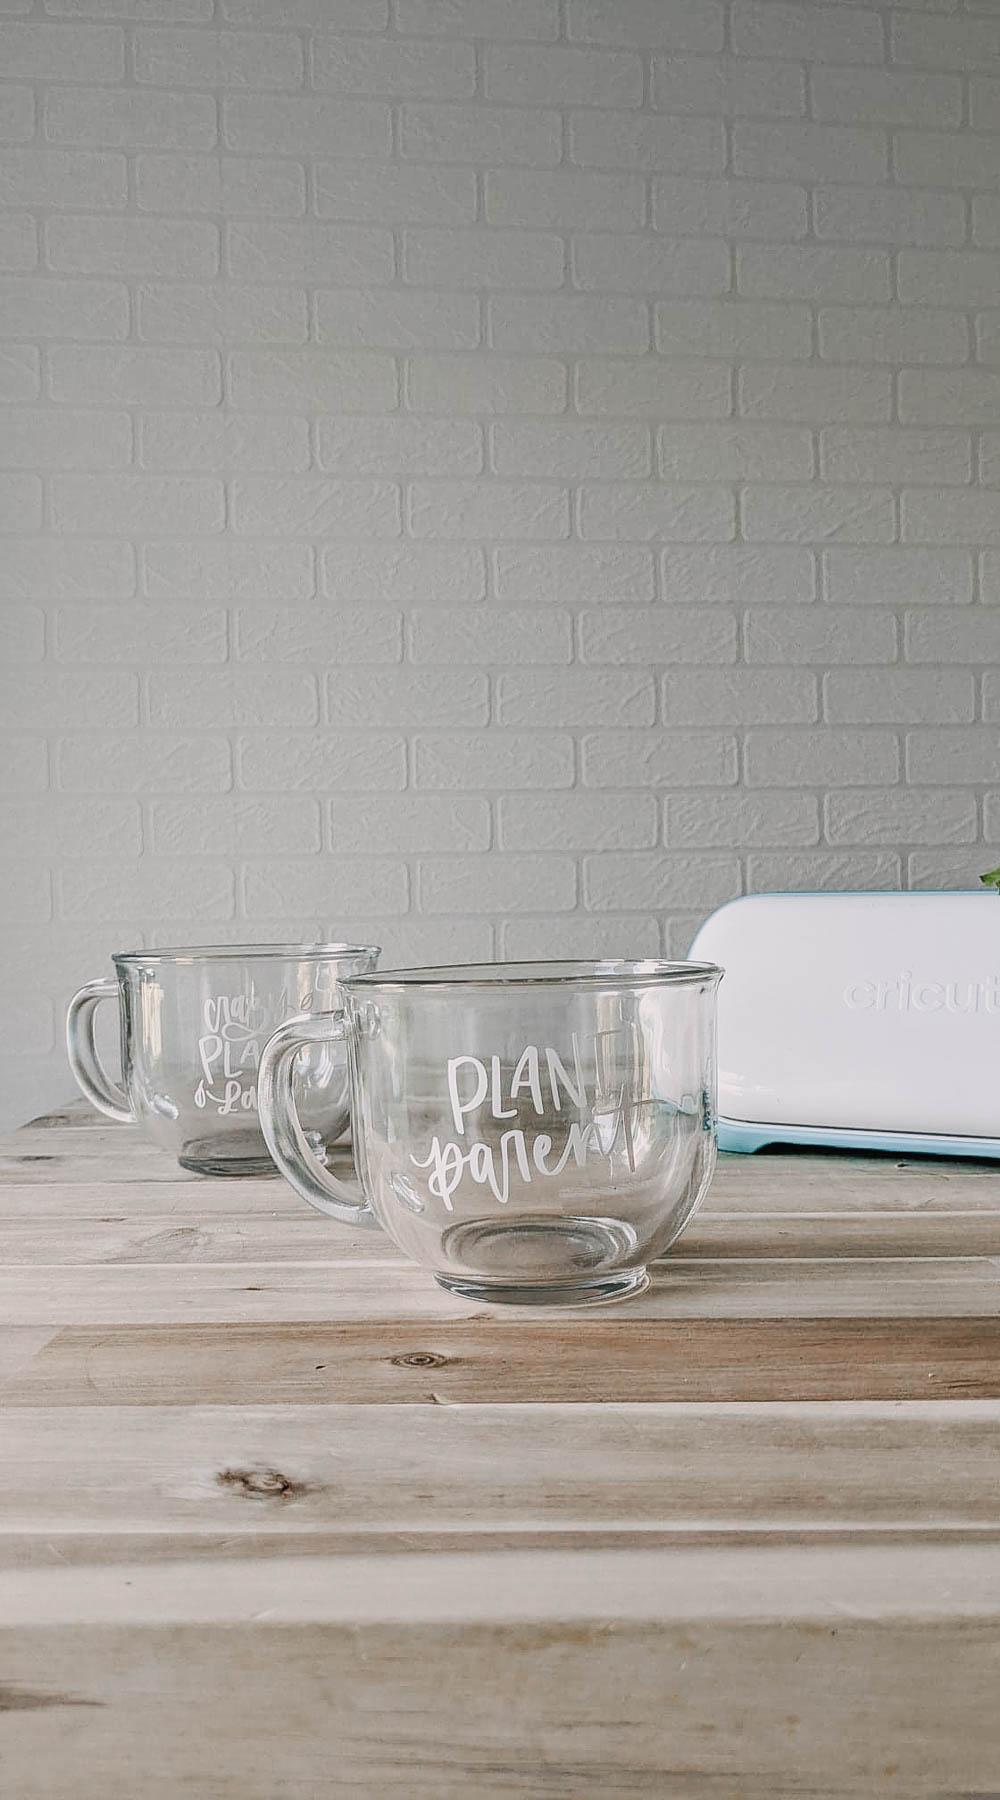 DIY Plant Parent Mugs